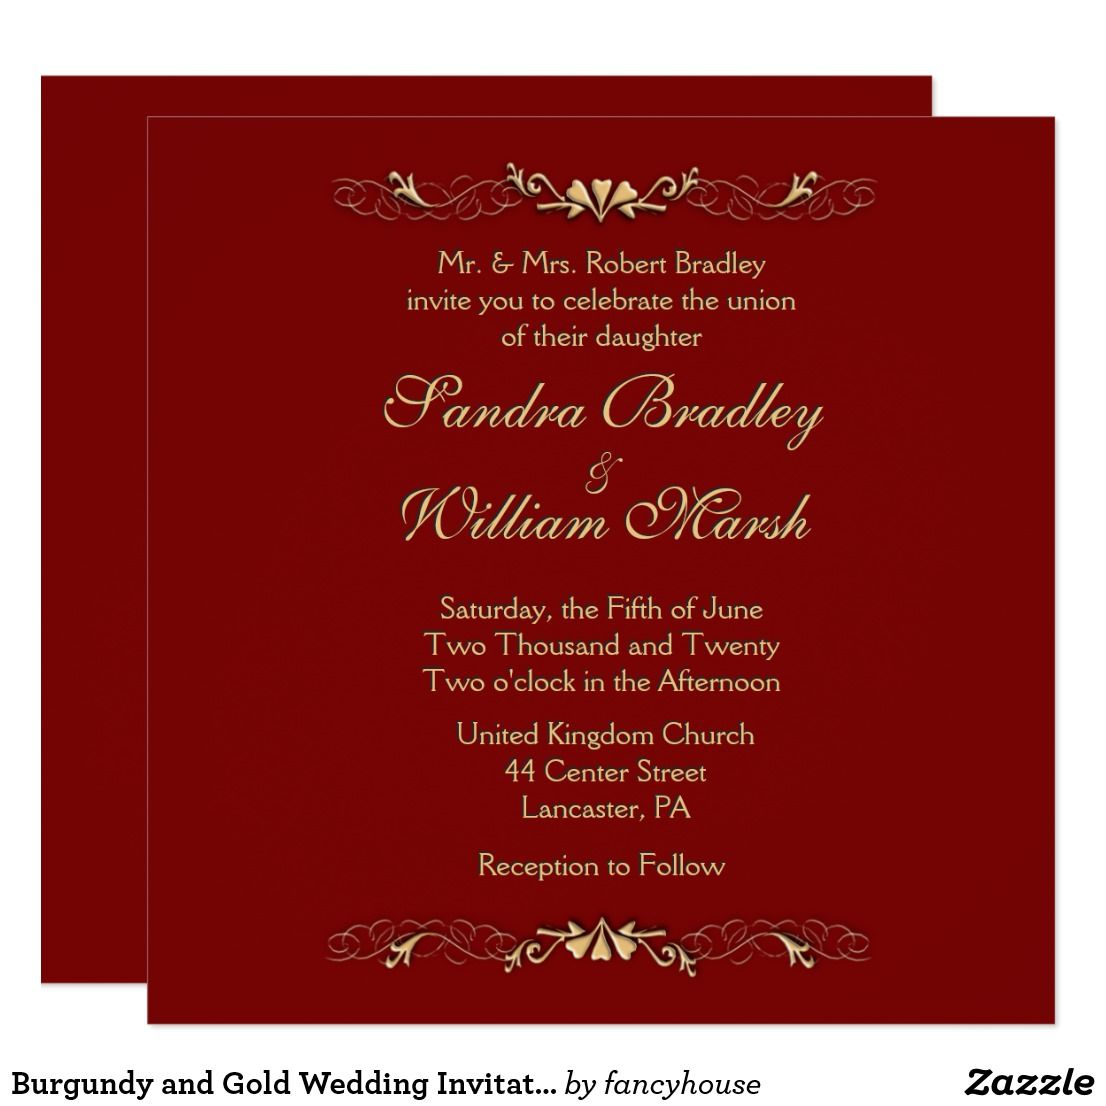 Burgundy and Gold Wedding Invitation | Gold weddings and Weddings